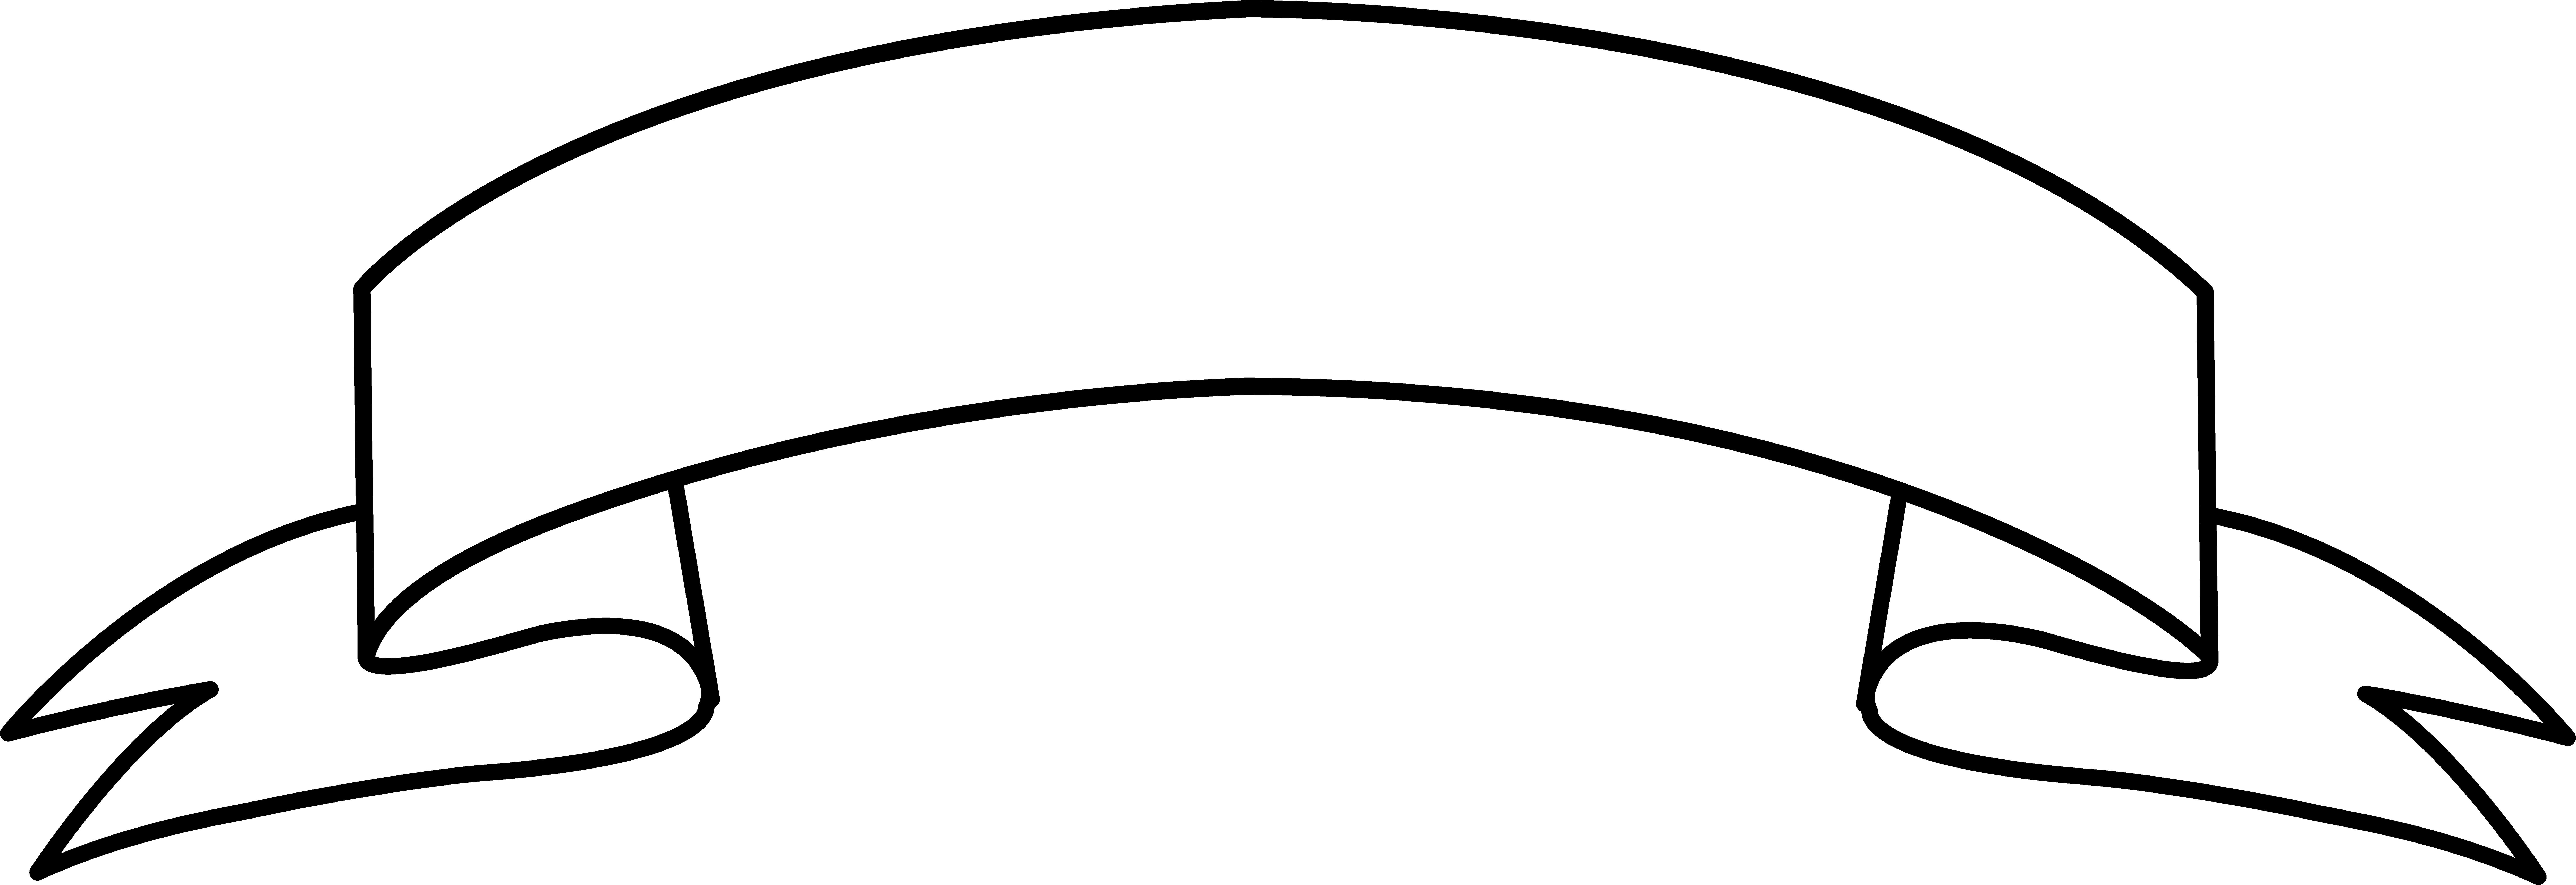 Logo ribbon clipart png svg BLANK RIBBON PNG - ClipArt Best svg